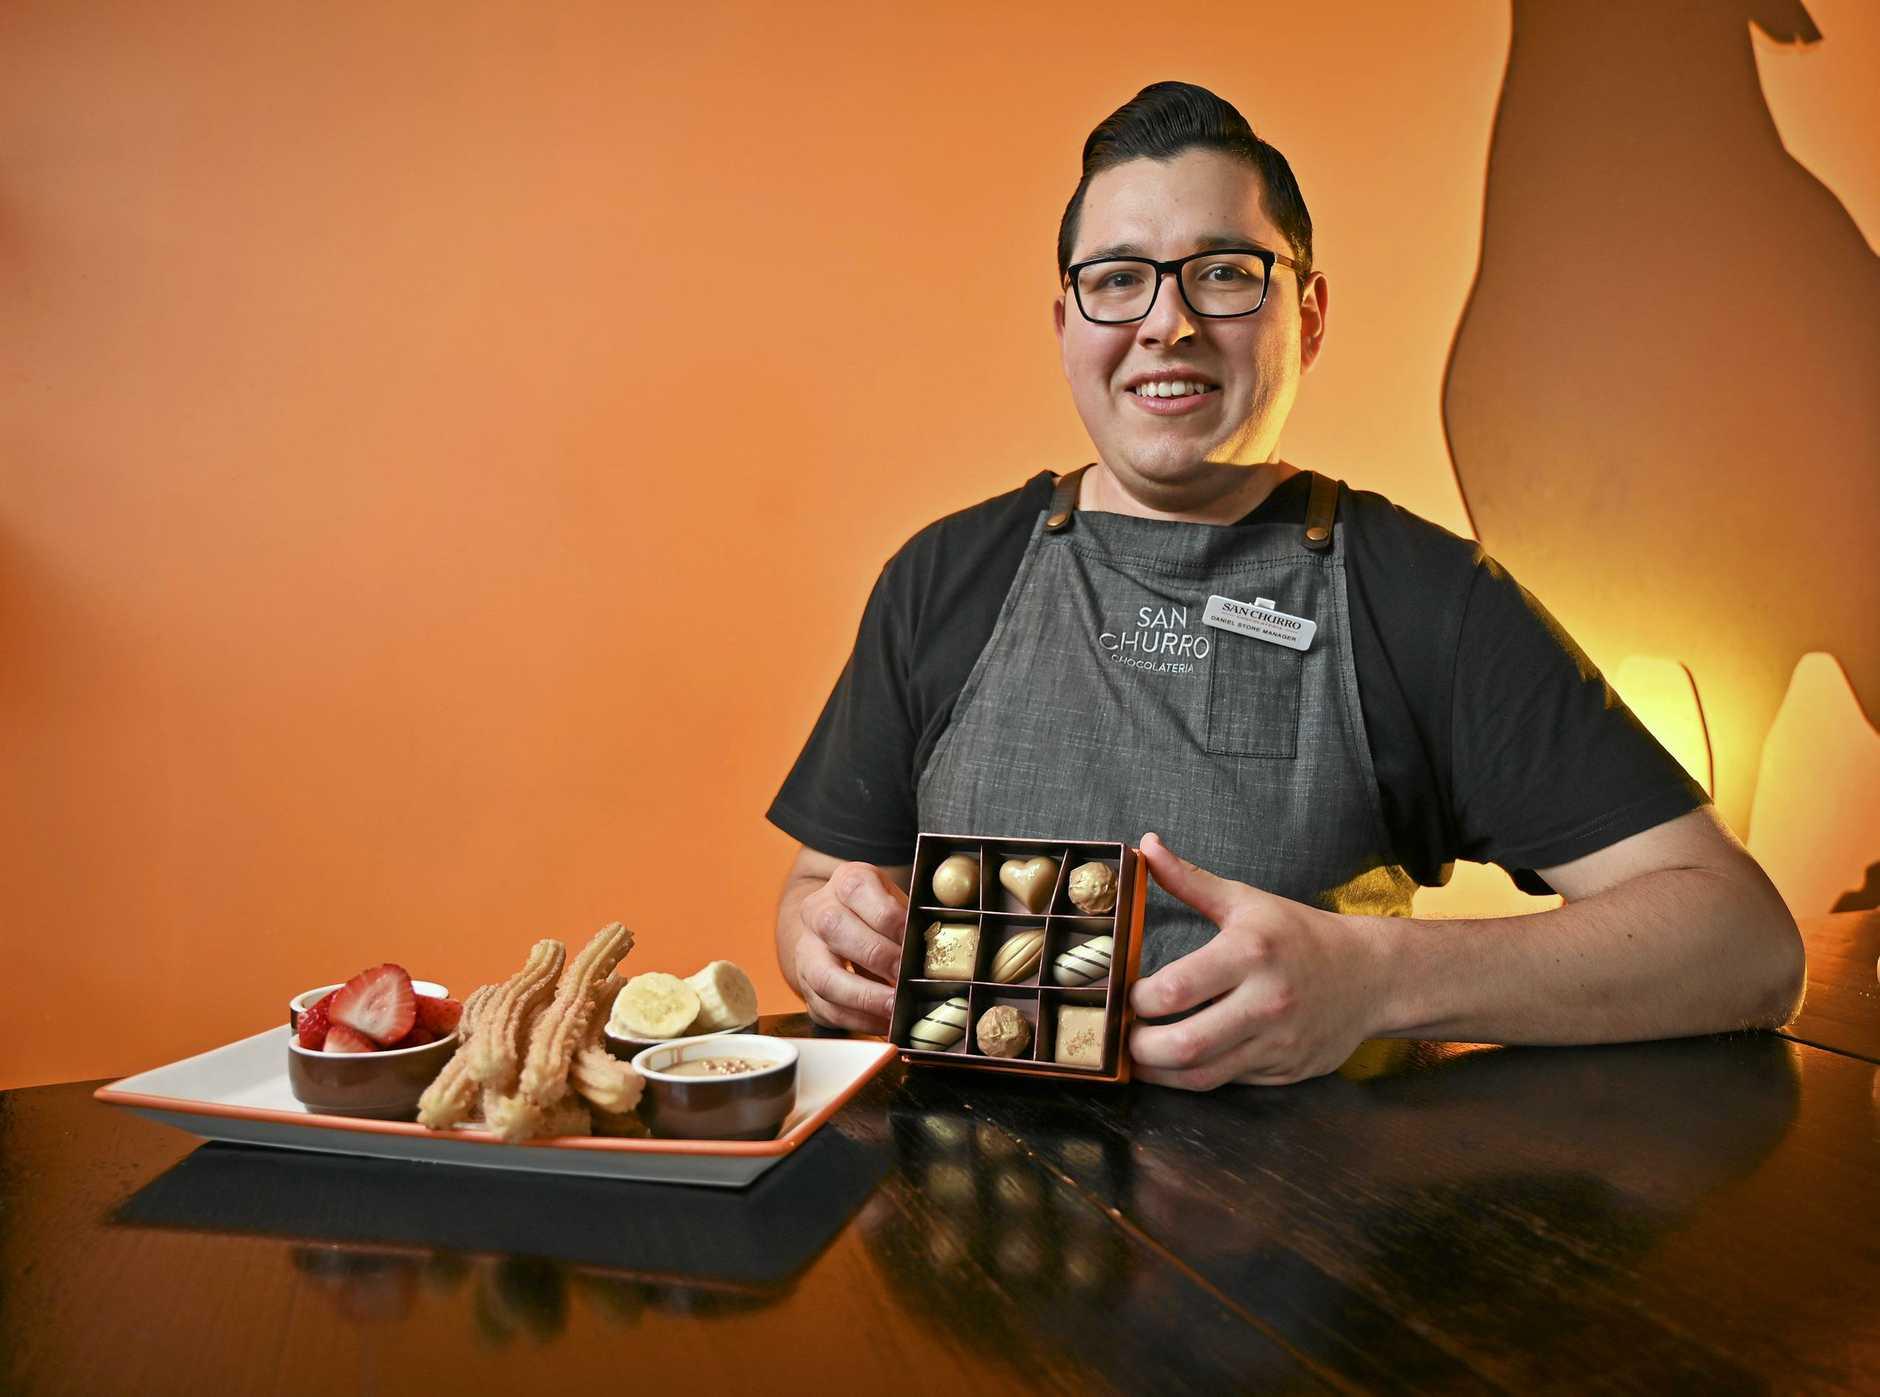 TASTE MAKER: San Churro Springfield store manager Daniel Aparicio.